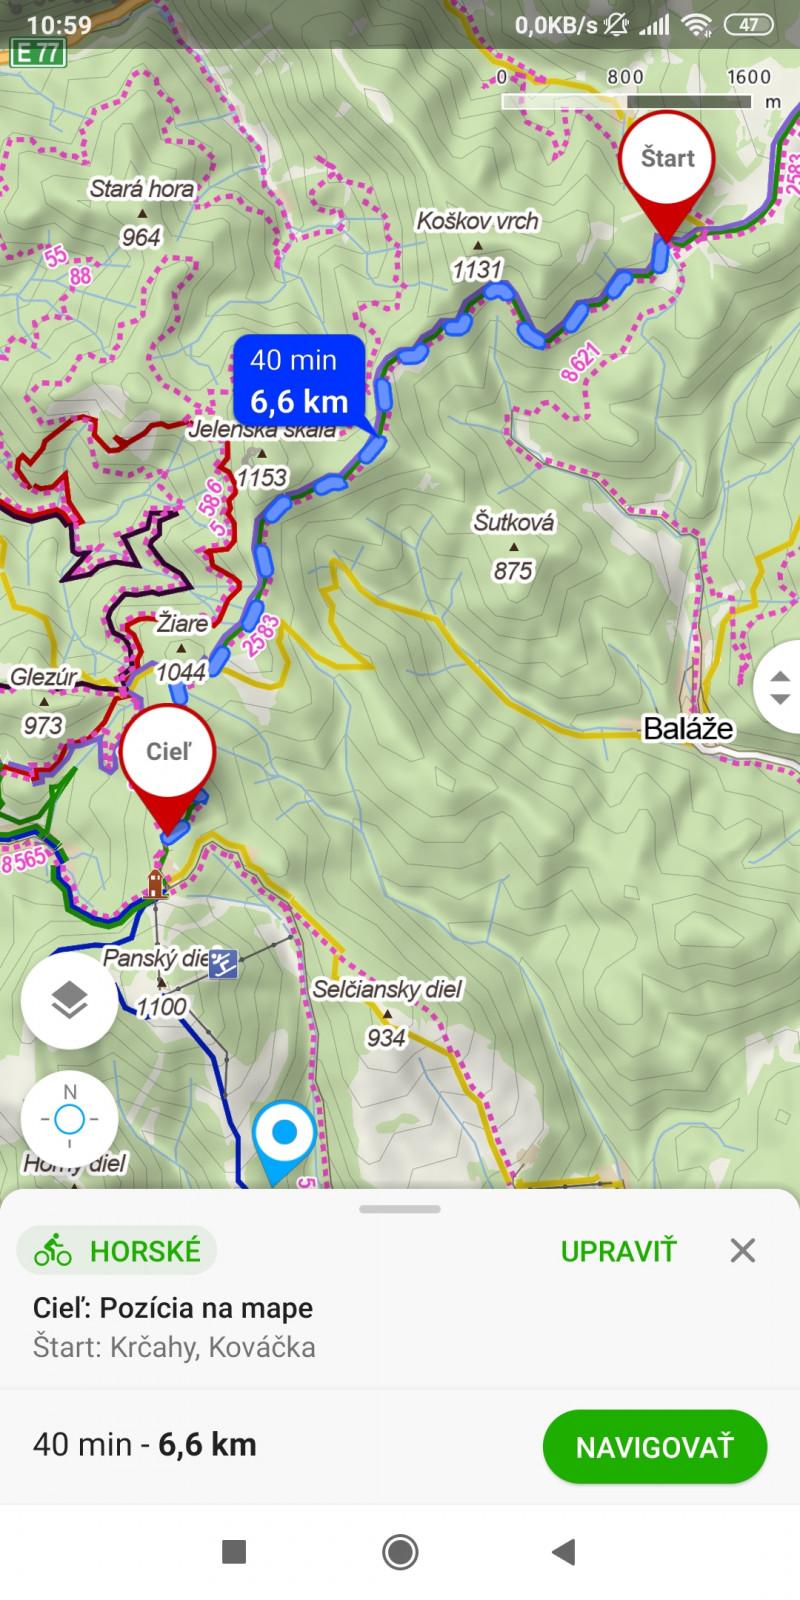 Screenshot_2020-10-20-10-59-41-106_cz.seznam.mapy.jpg